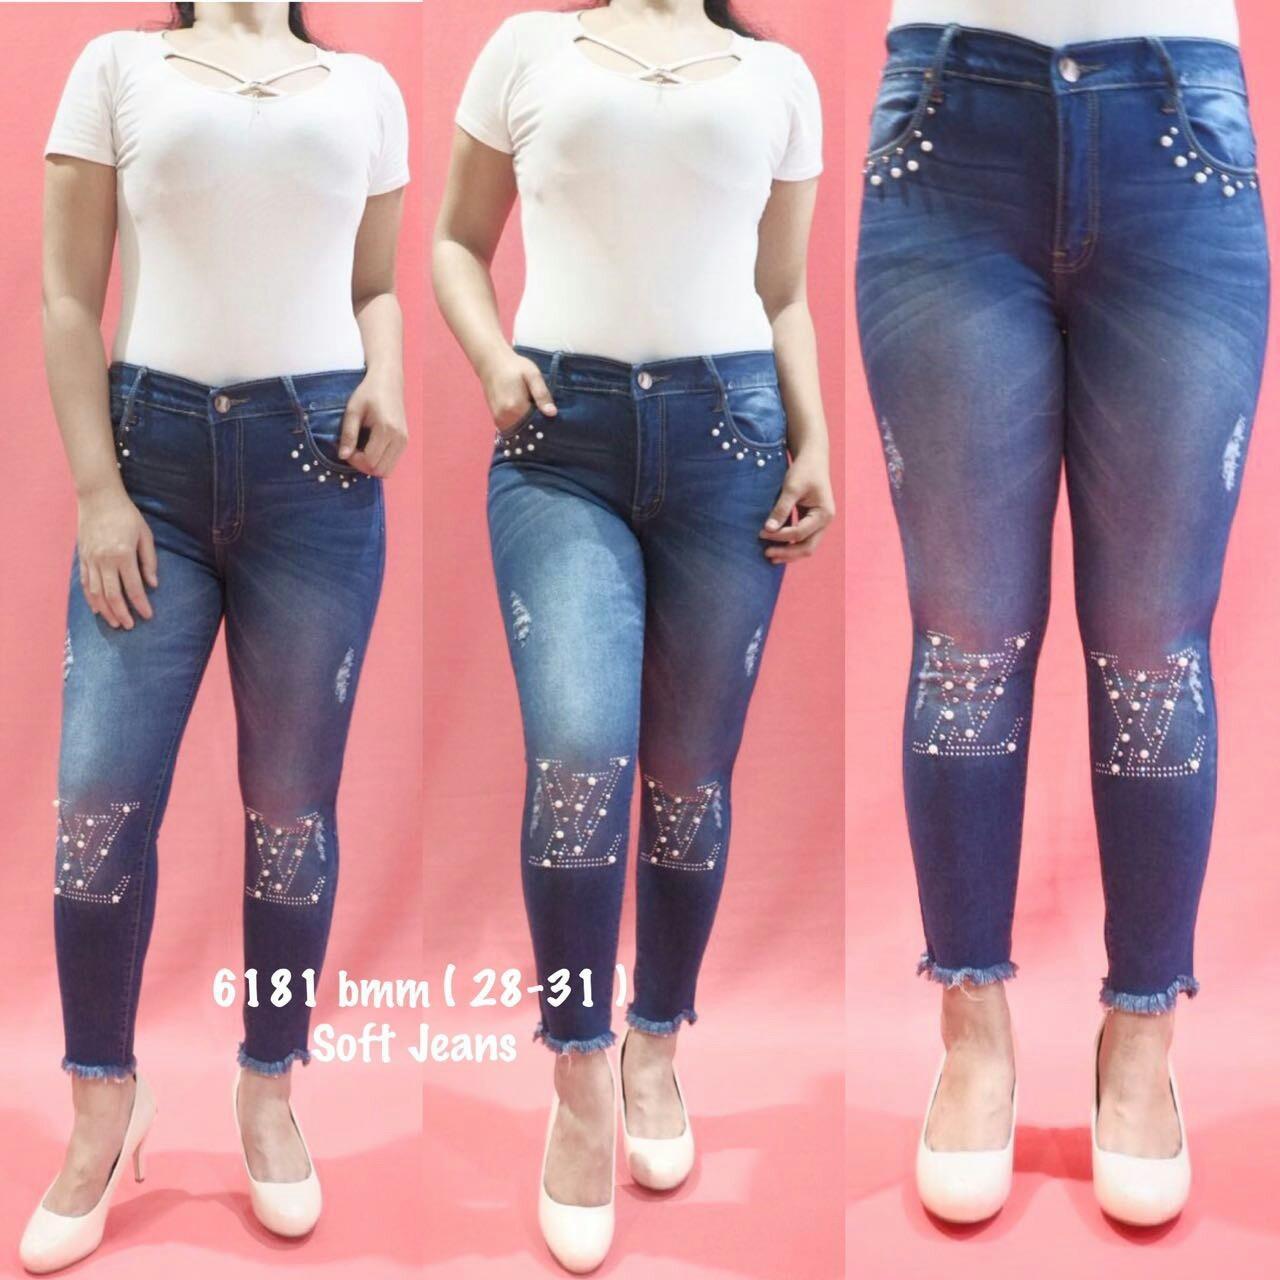 NM Jeans Mutiara Blue 2 Ukuran 27-30 Celana Panjang Soft Jeans Wanita  Elegant Exclusive 39f515069c